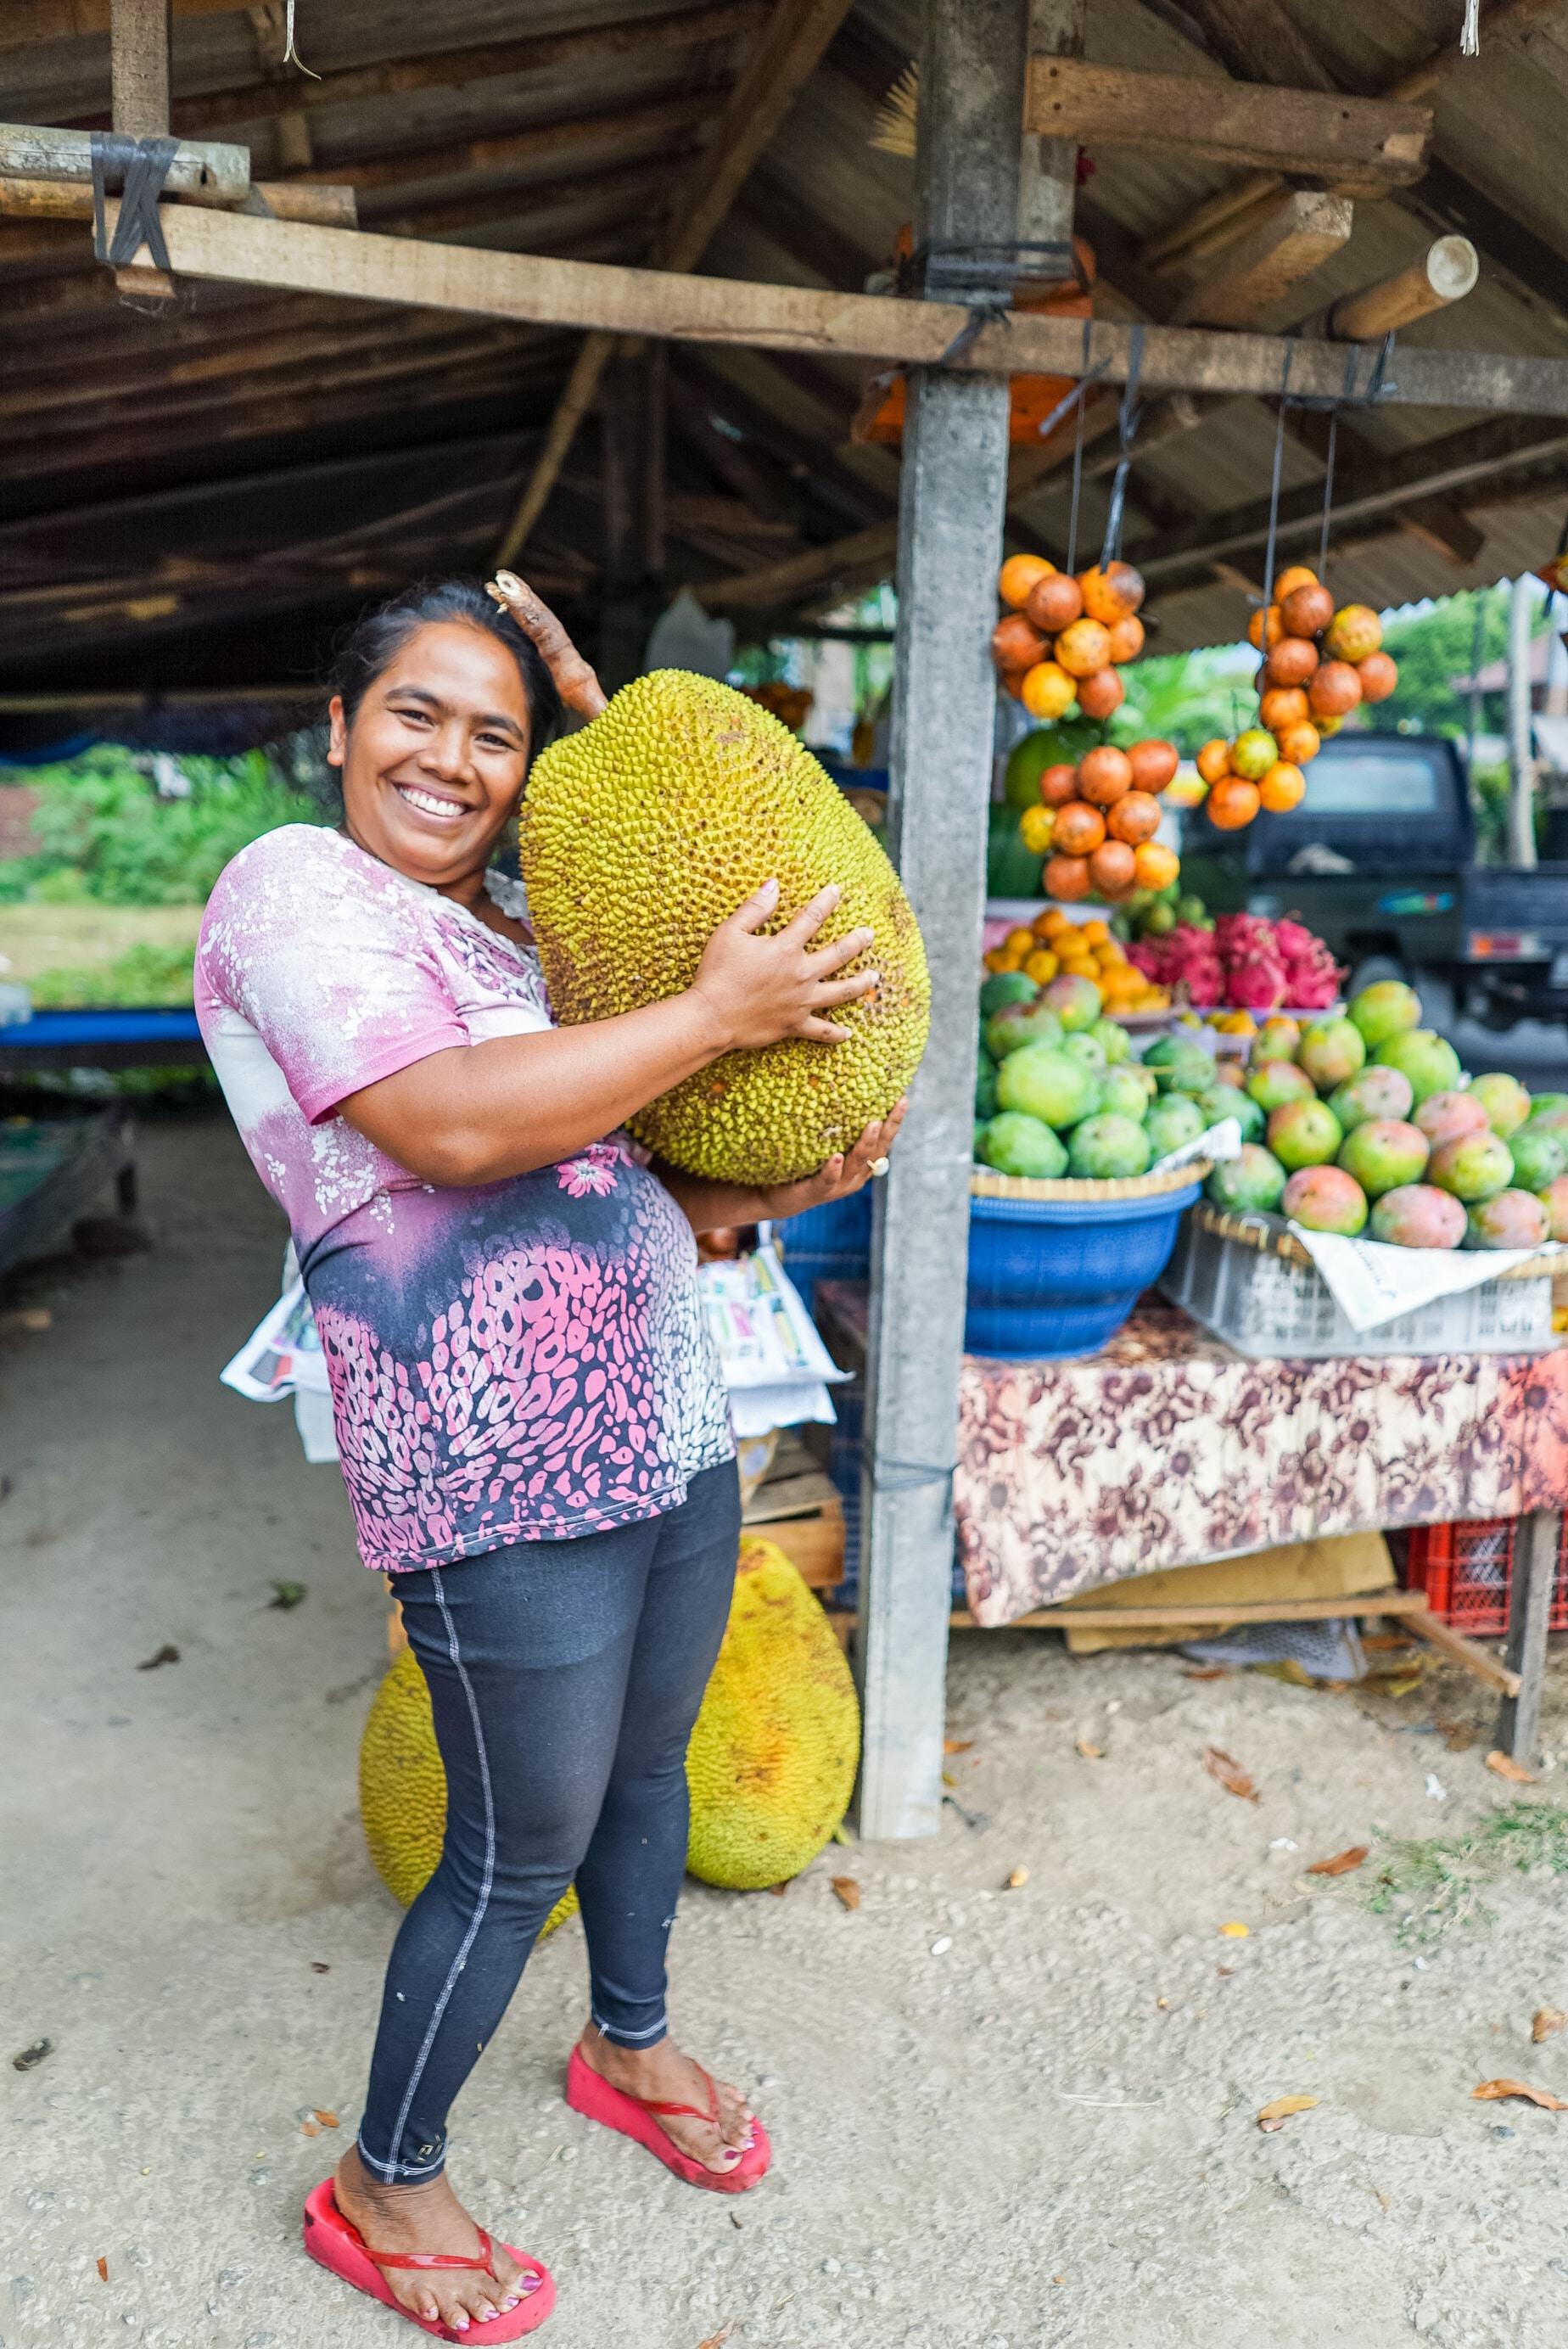 exotic-jackfruit-fruit-for-cooking